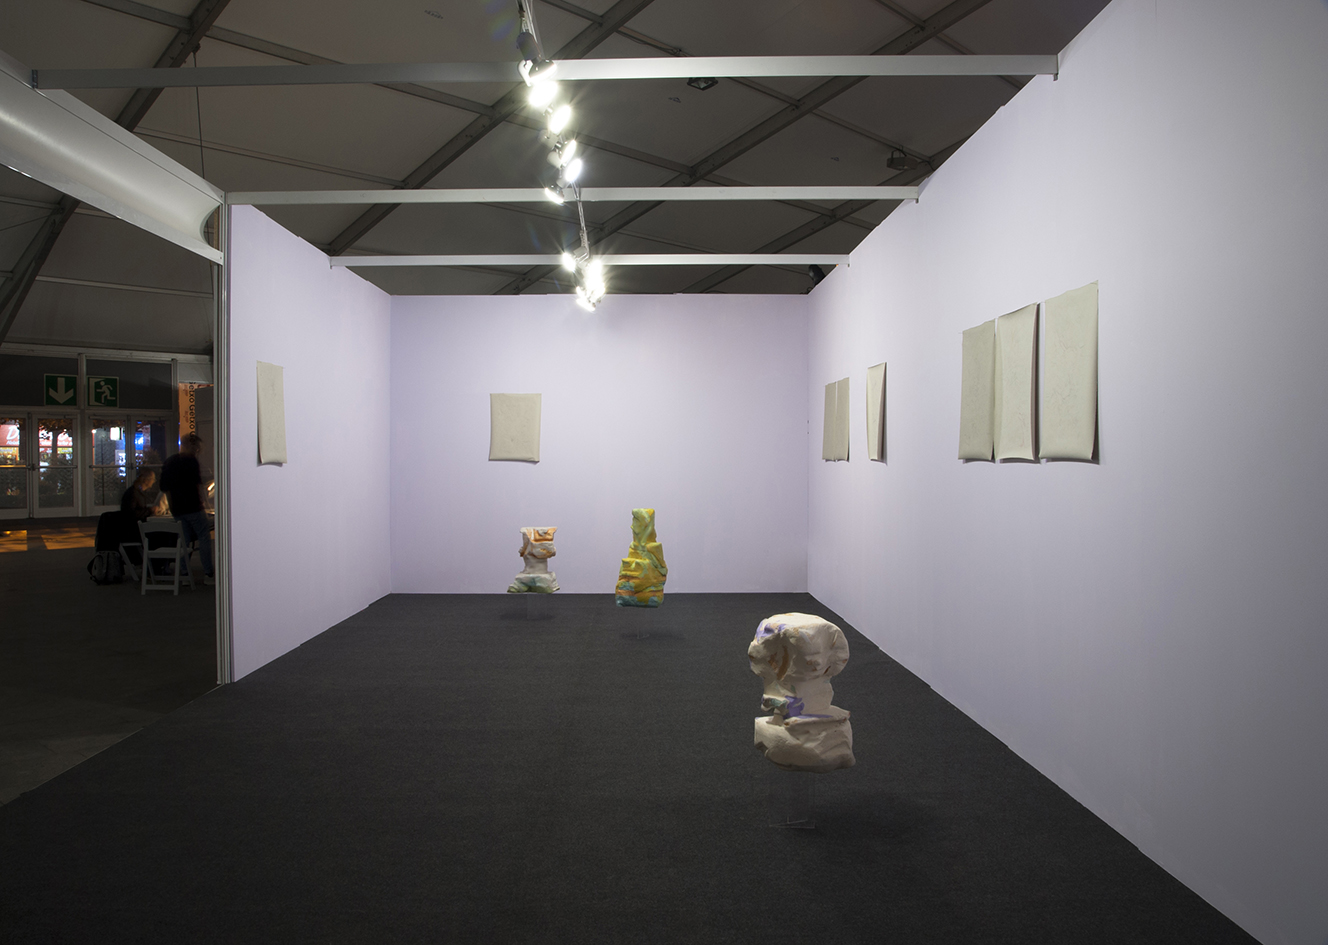 2017 installation view at Getxoarte w/ Salón Bilbao ES